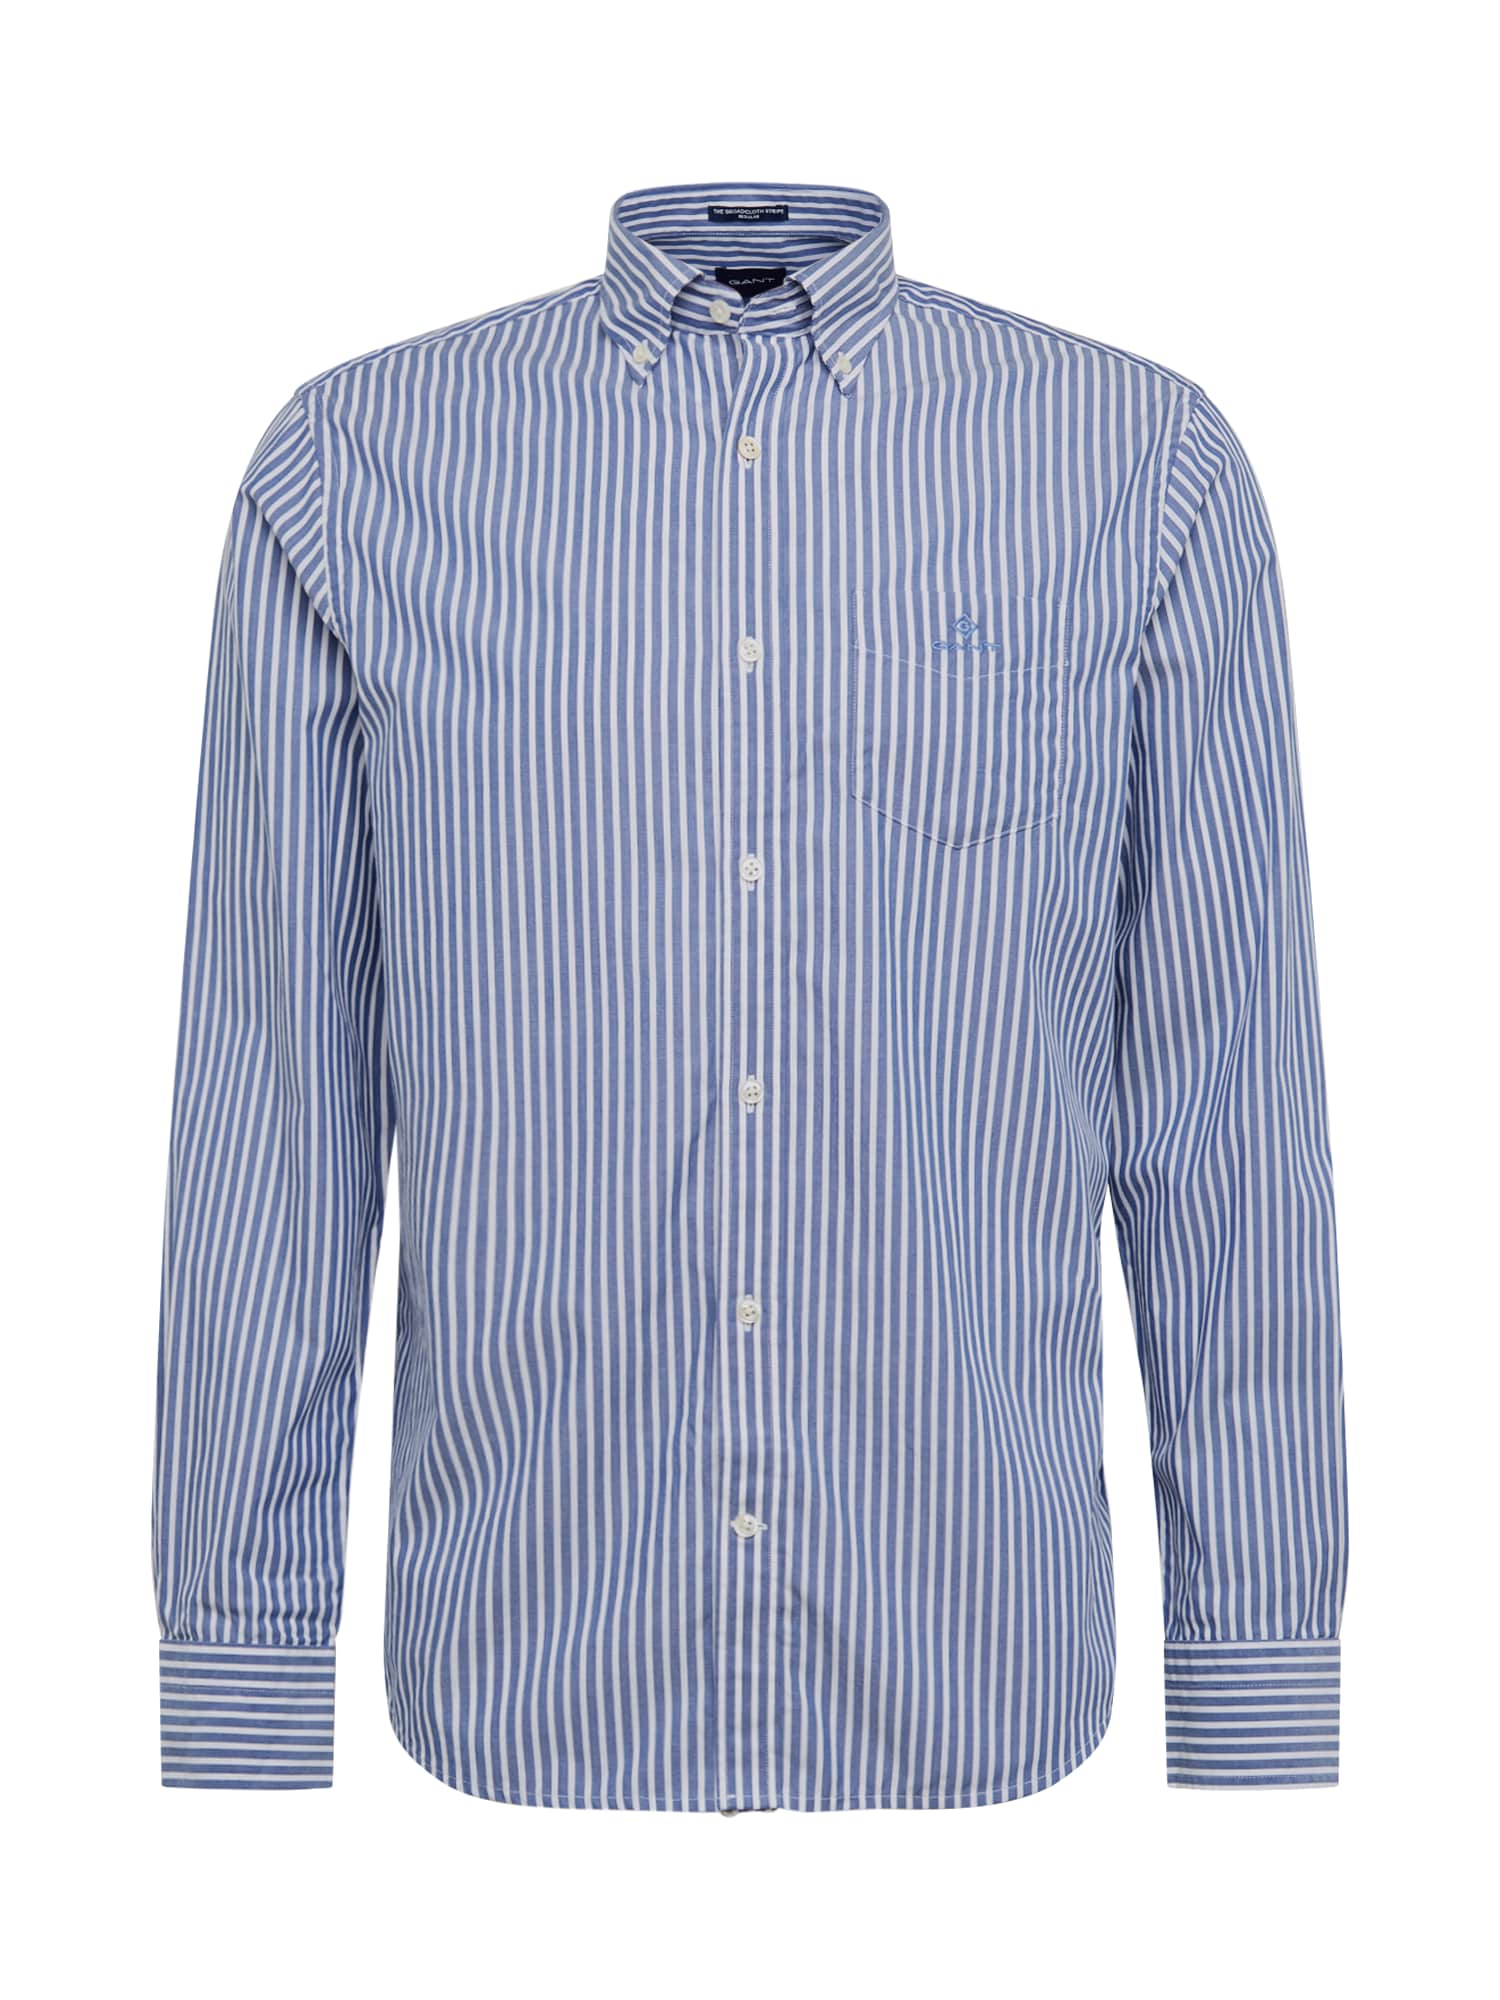 GANT Marškiniai mėlyna / balta